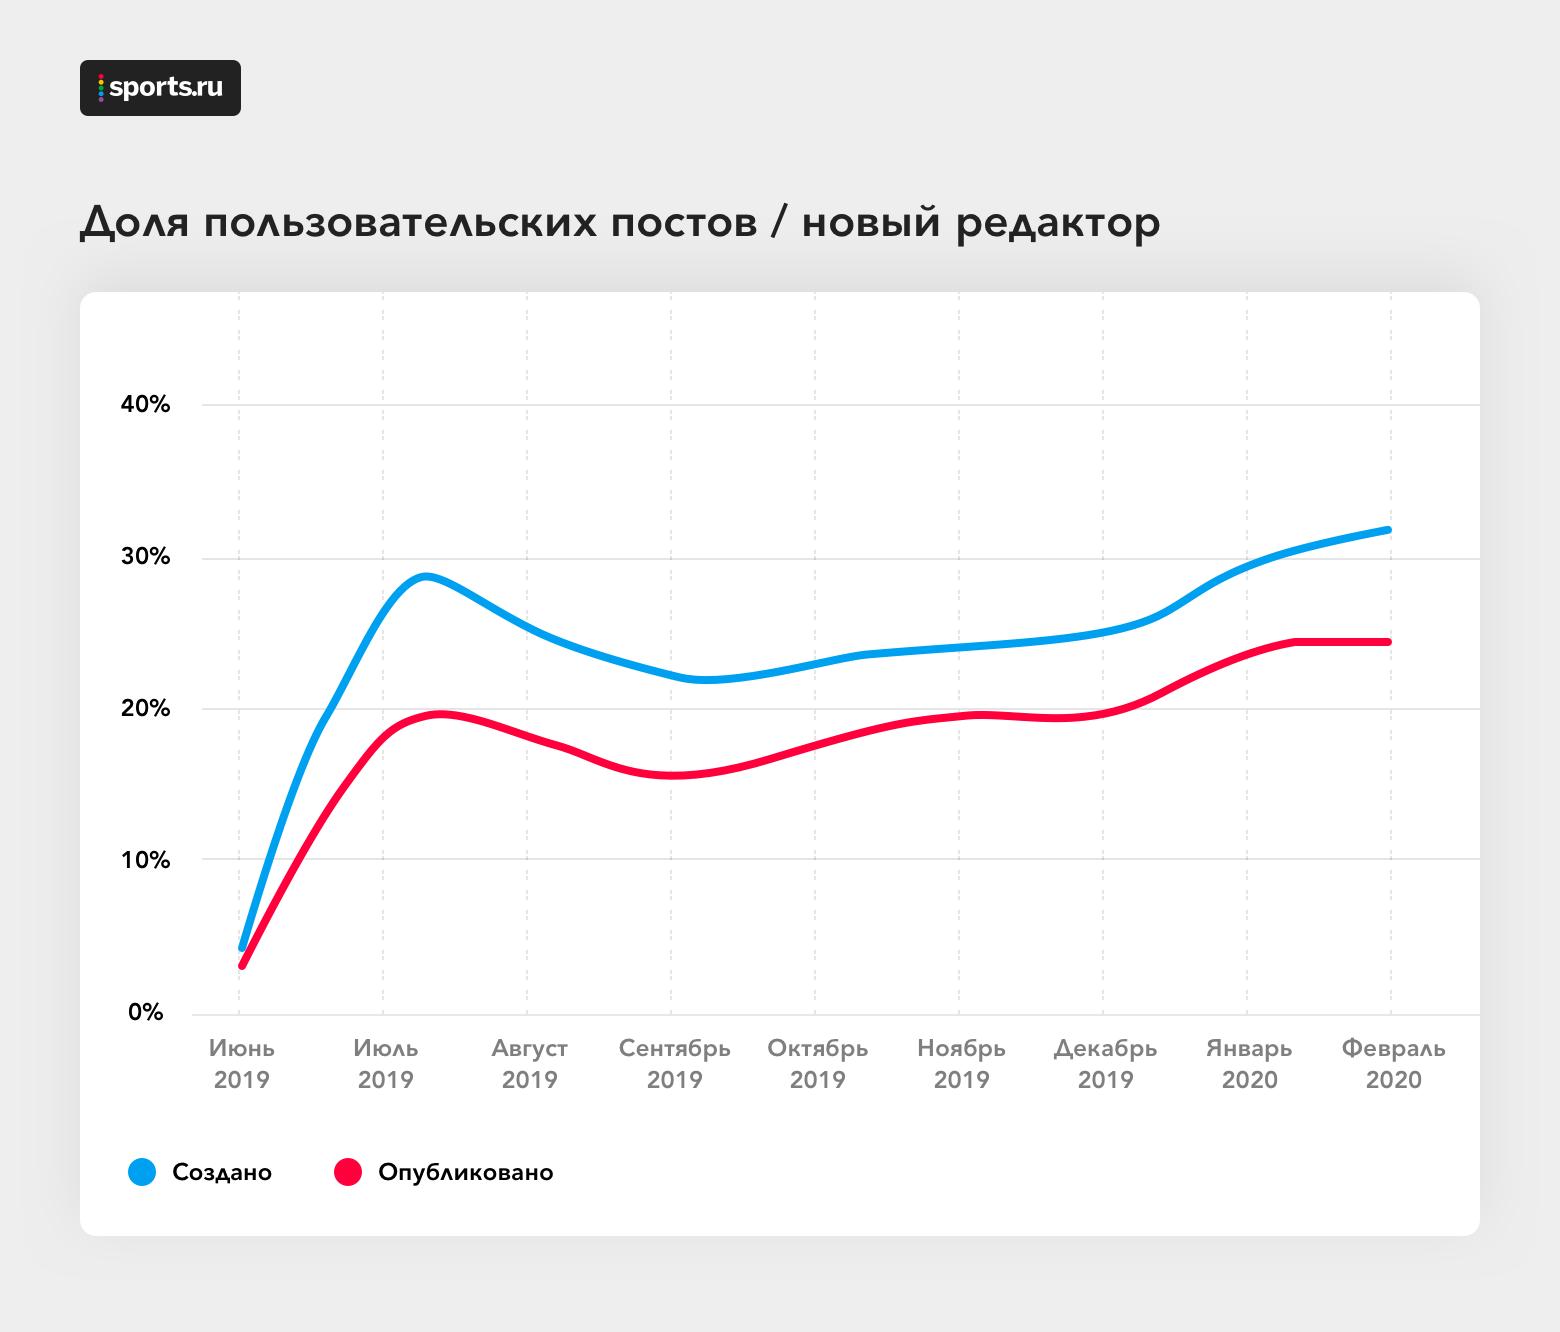 Как в Sports.ru писали свой WYSIWYG-редактор - 5